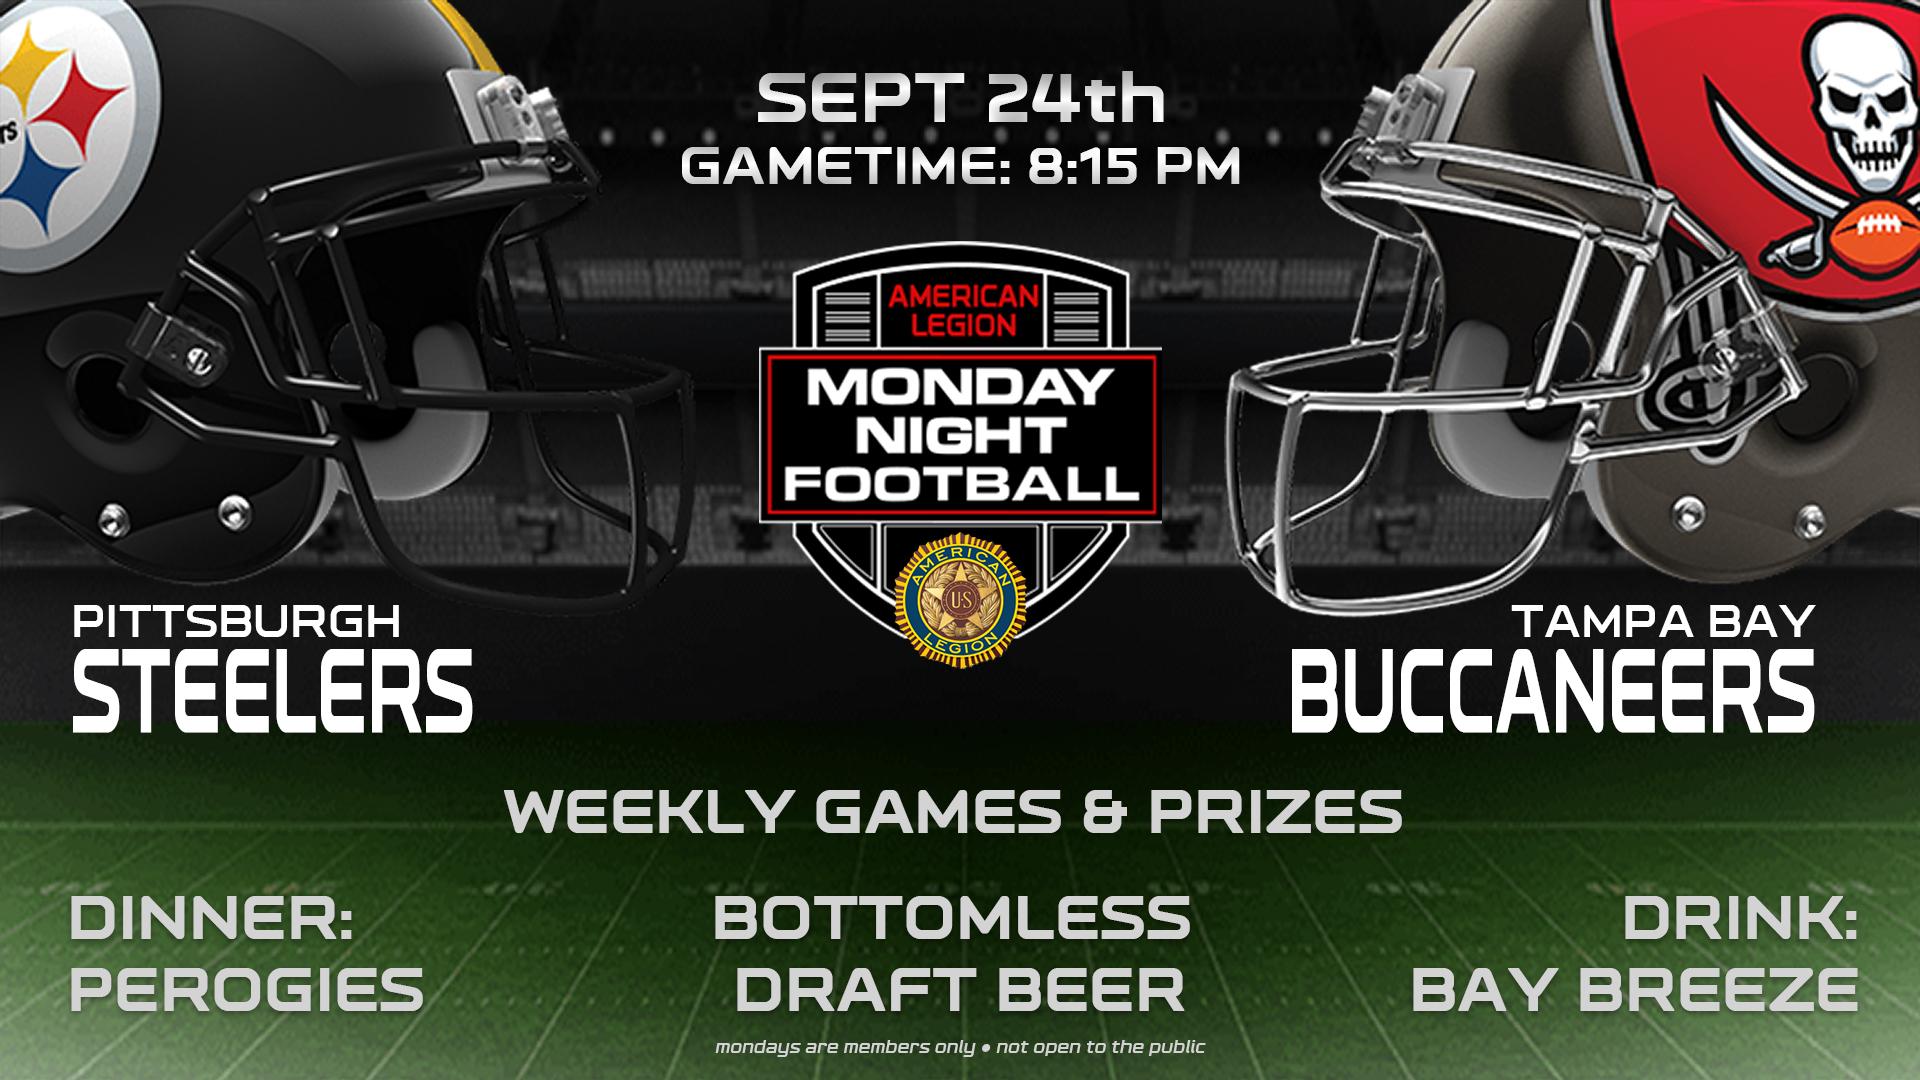 Monday Night Football Sept 24th